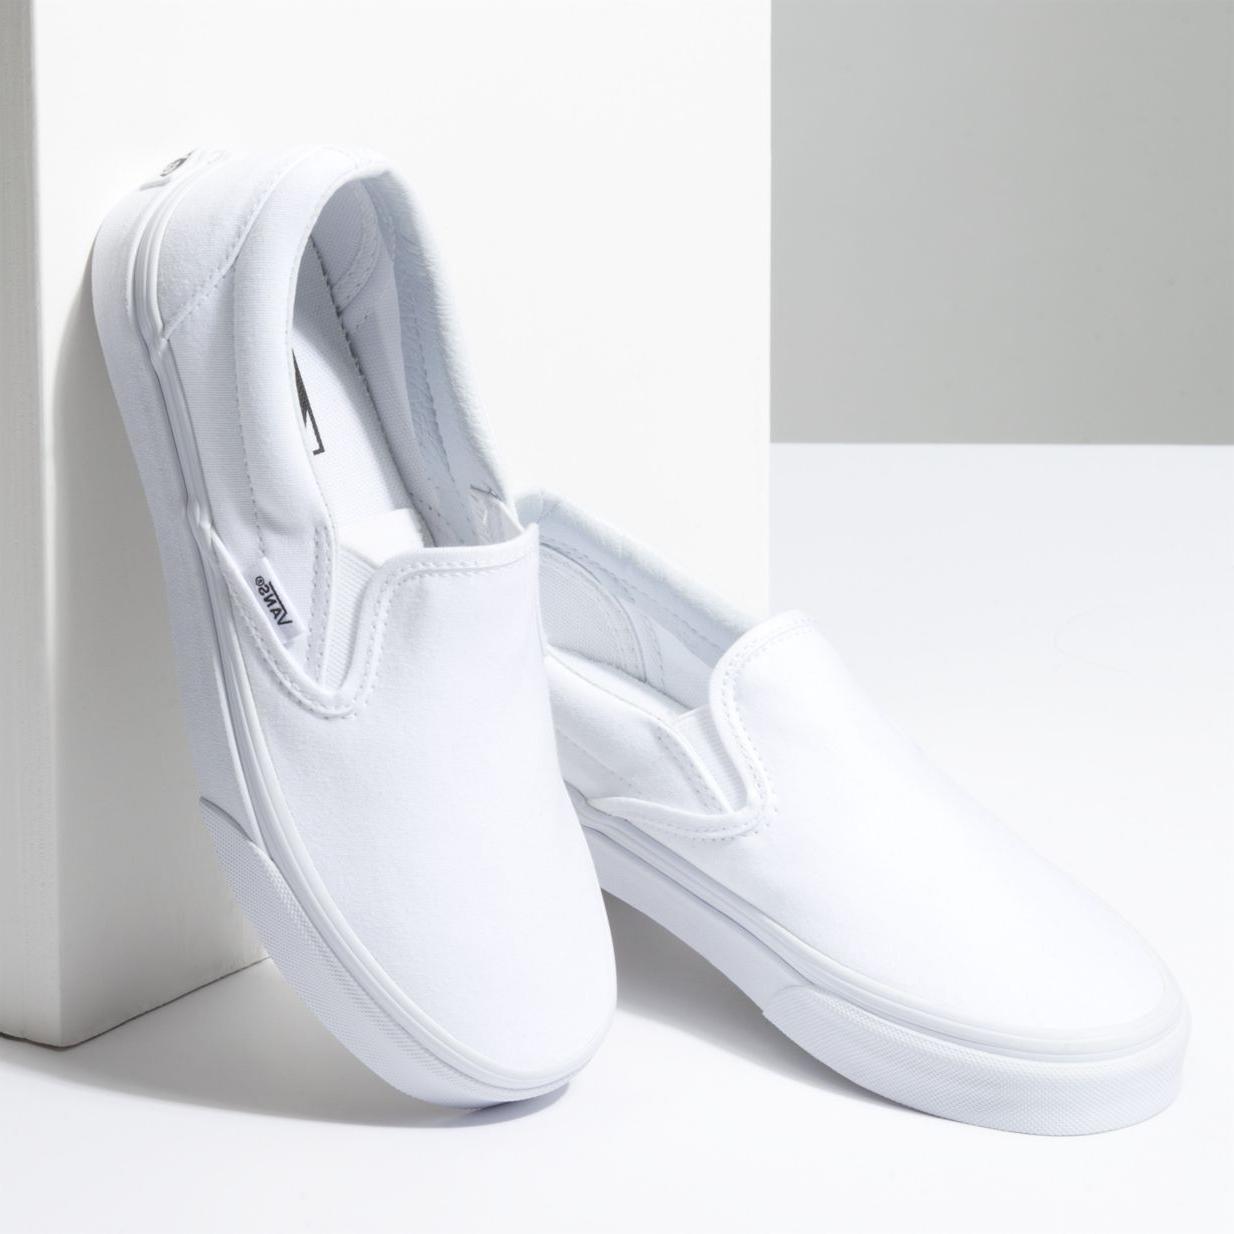 New Men & Women Vans New Classic Slip-On True White Sneakers Canvas